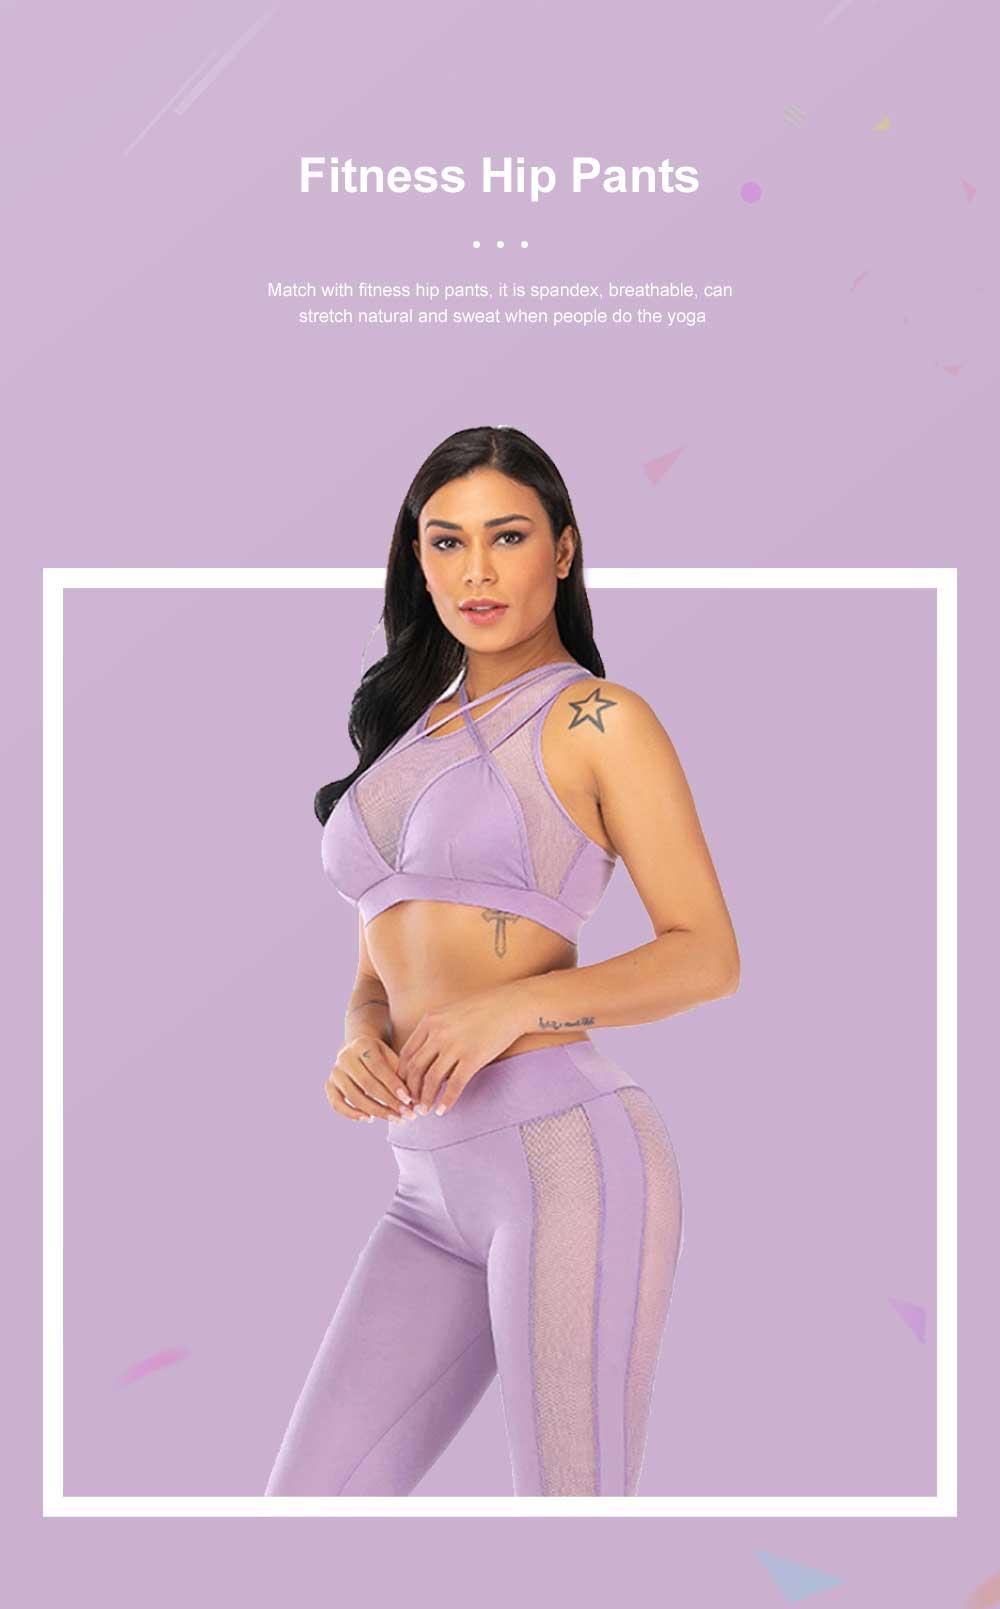 Fashion Sexy Women Two Piece Sport Bra Pants Yoga Fitness Hip Pants Set Cross Straps Hollow Matching Mesh Lady Wear Set 2